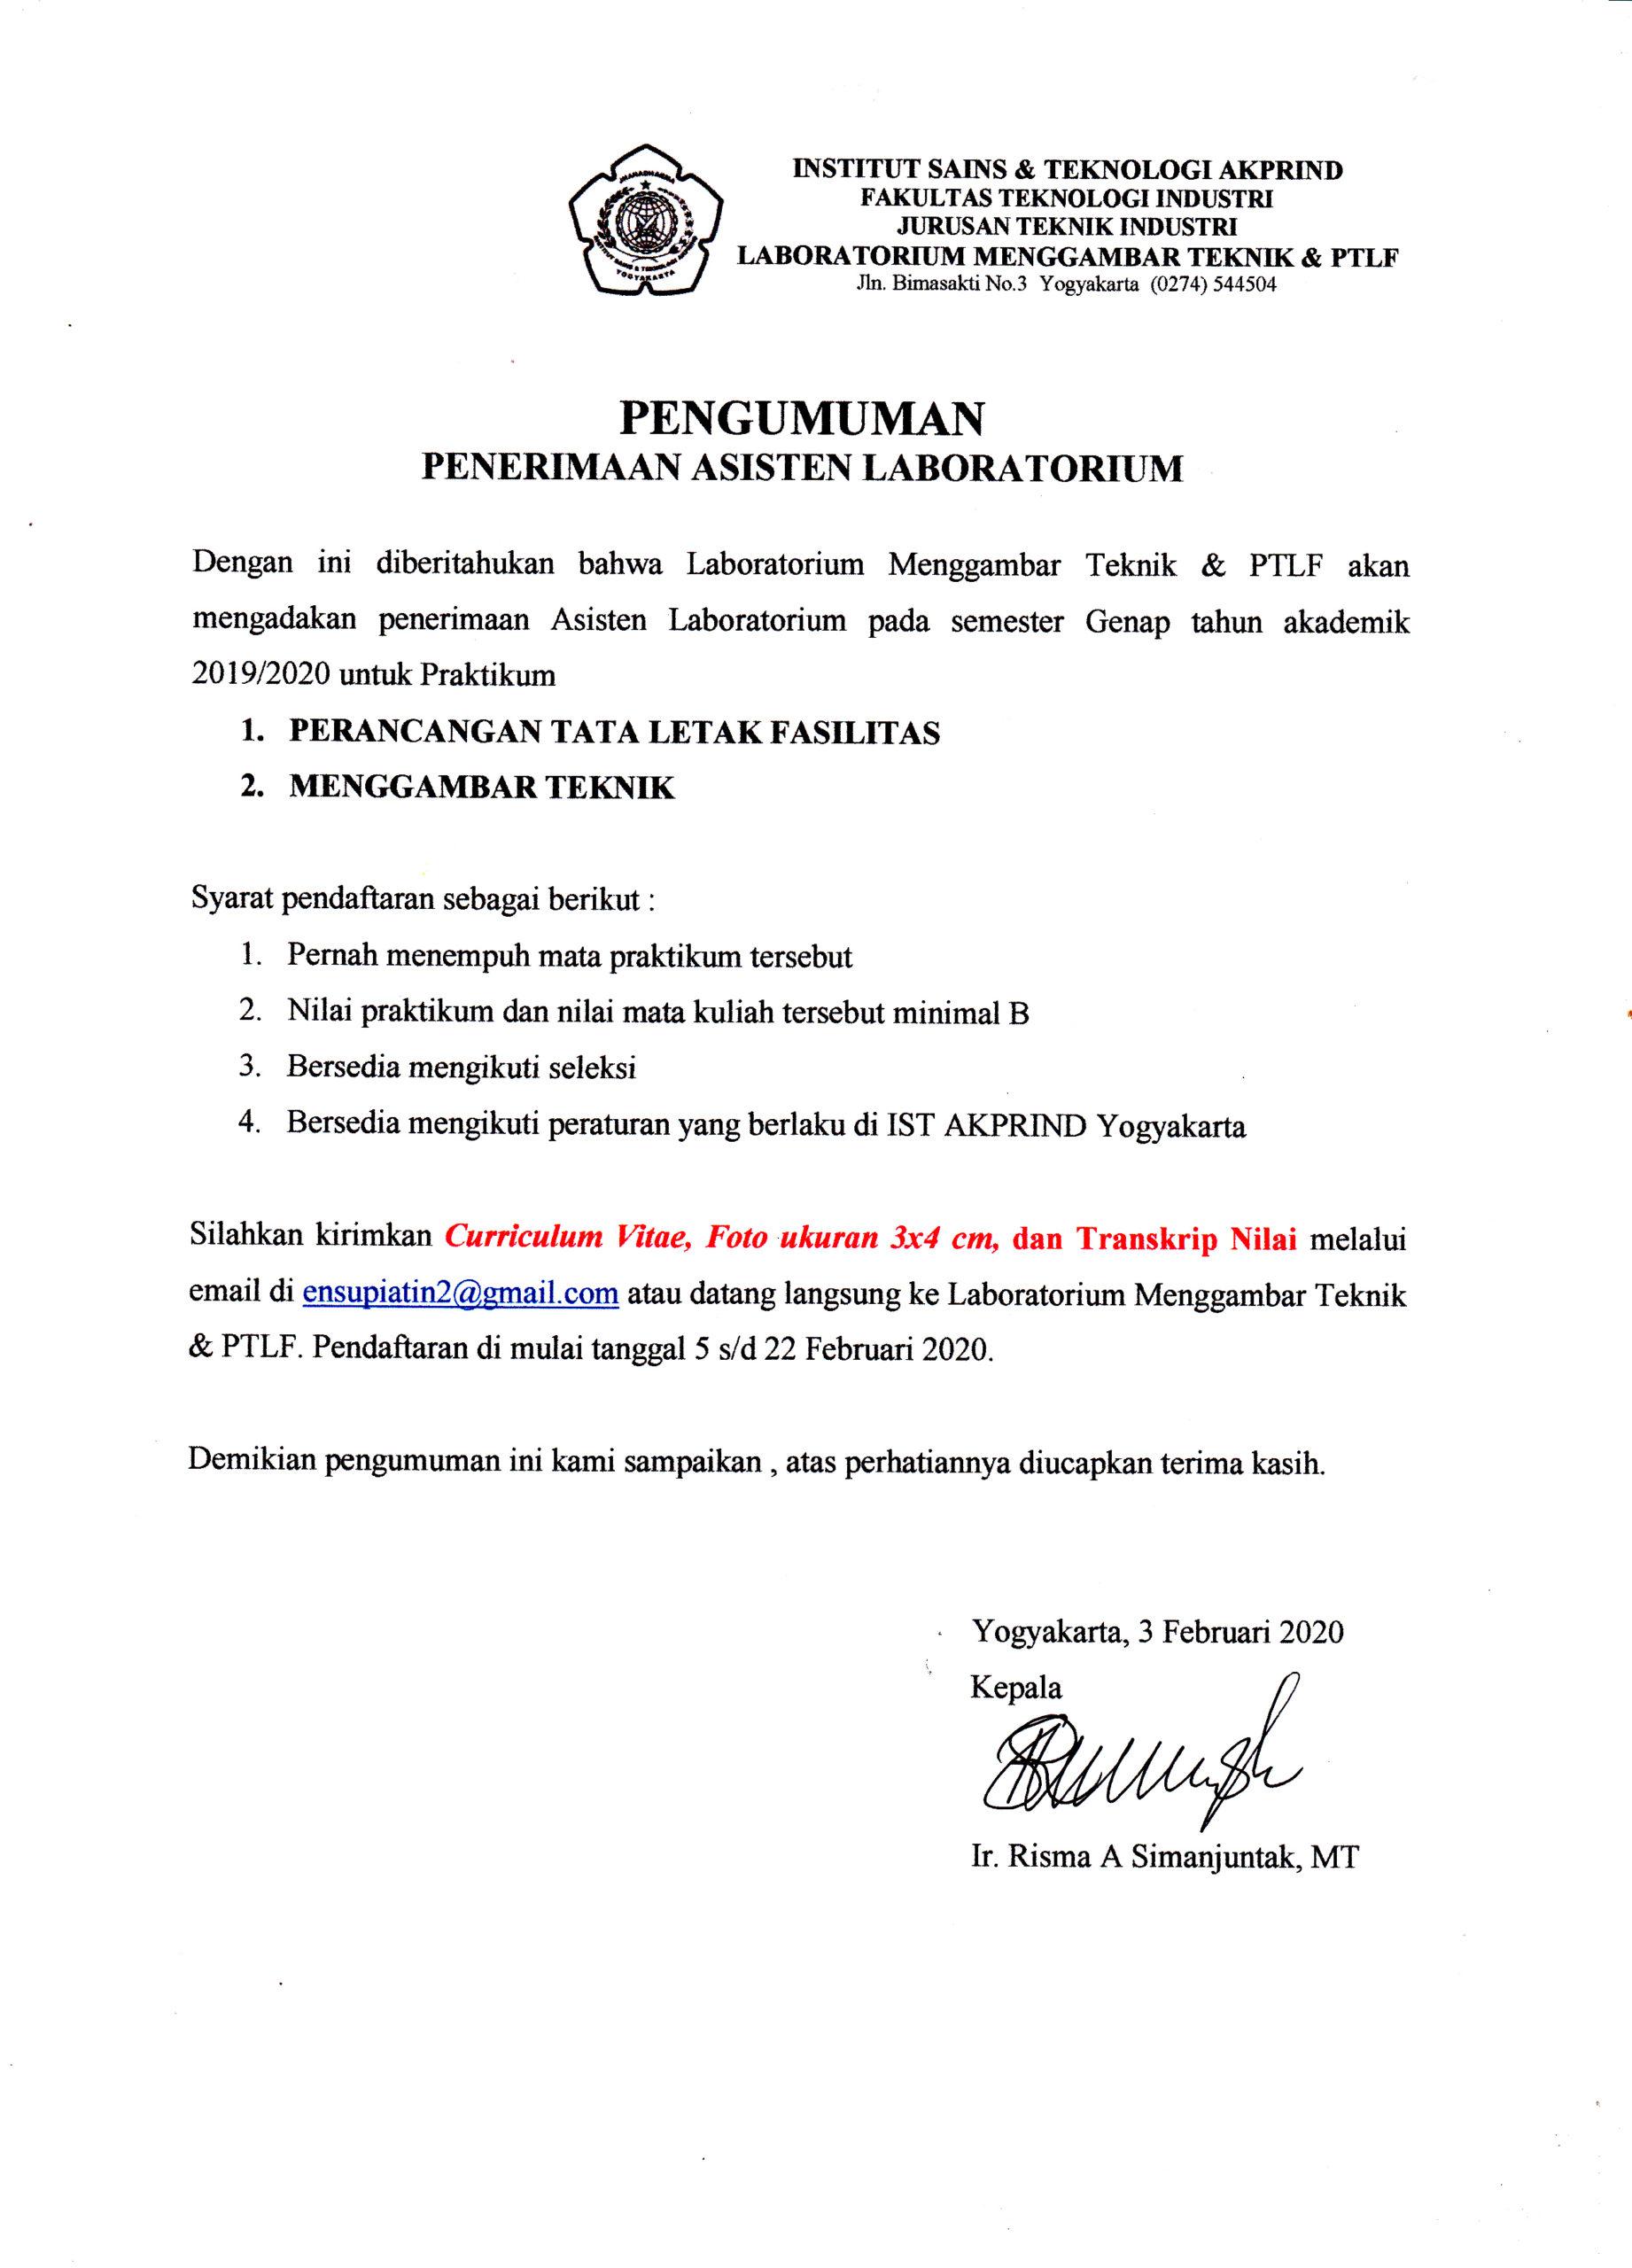 Penerimaan Aslab Menggambar Teknik & PTLF Sem Genap 2019/2020